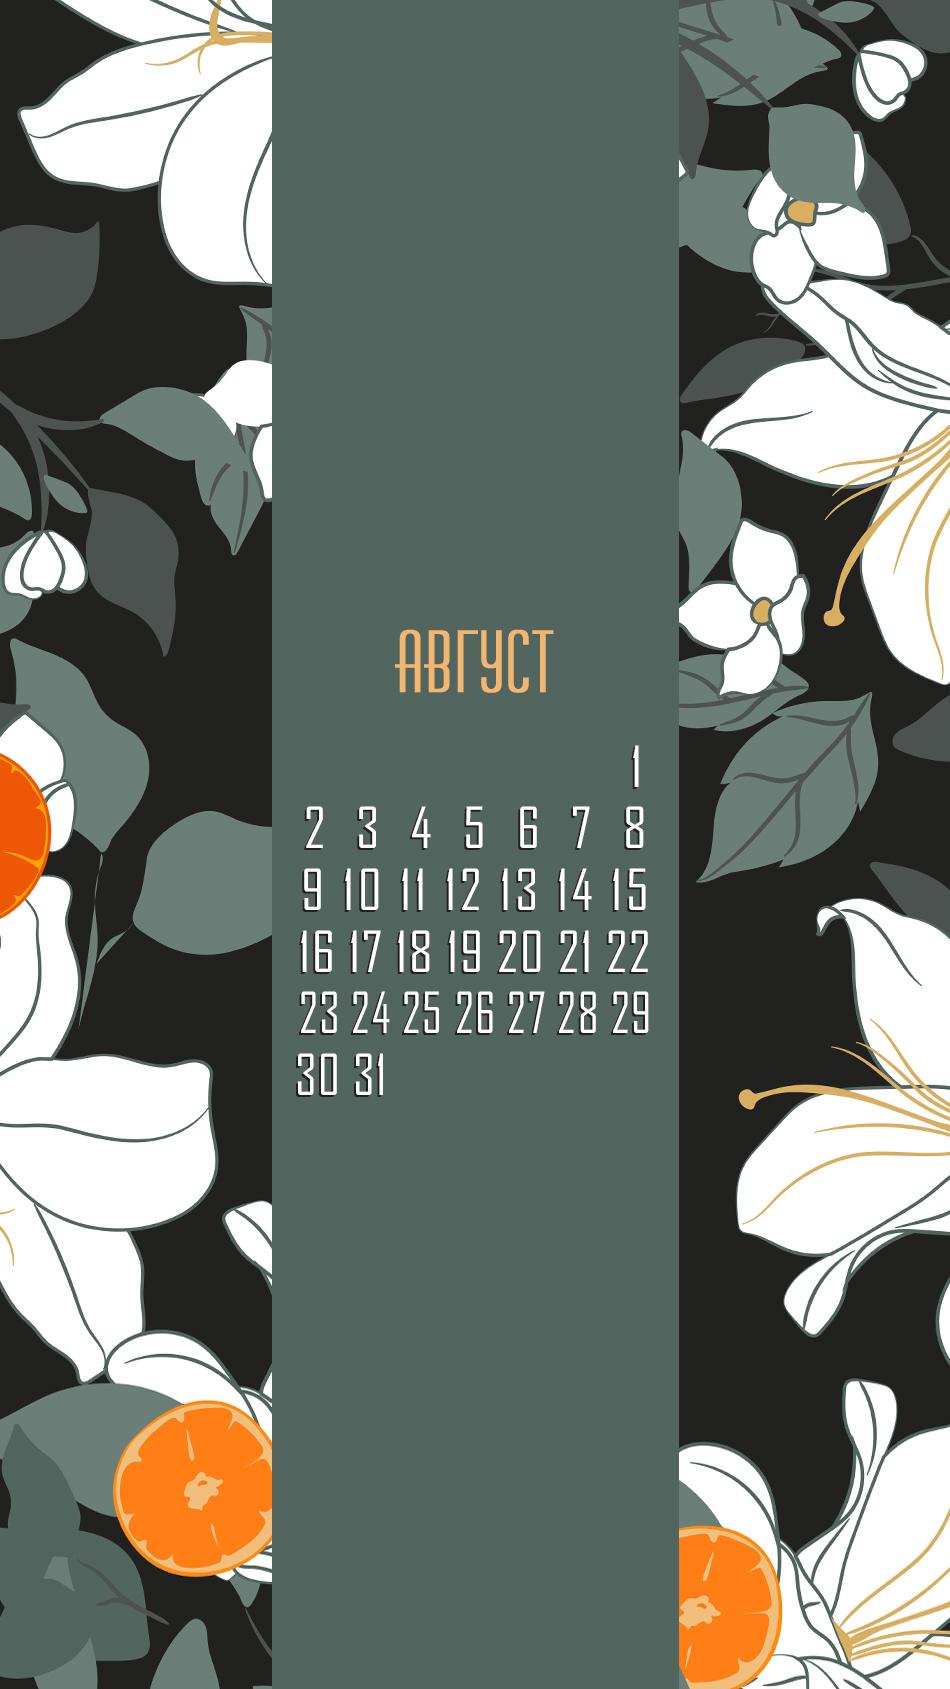 календарь на август 7 district-f.org